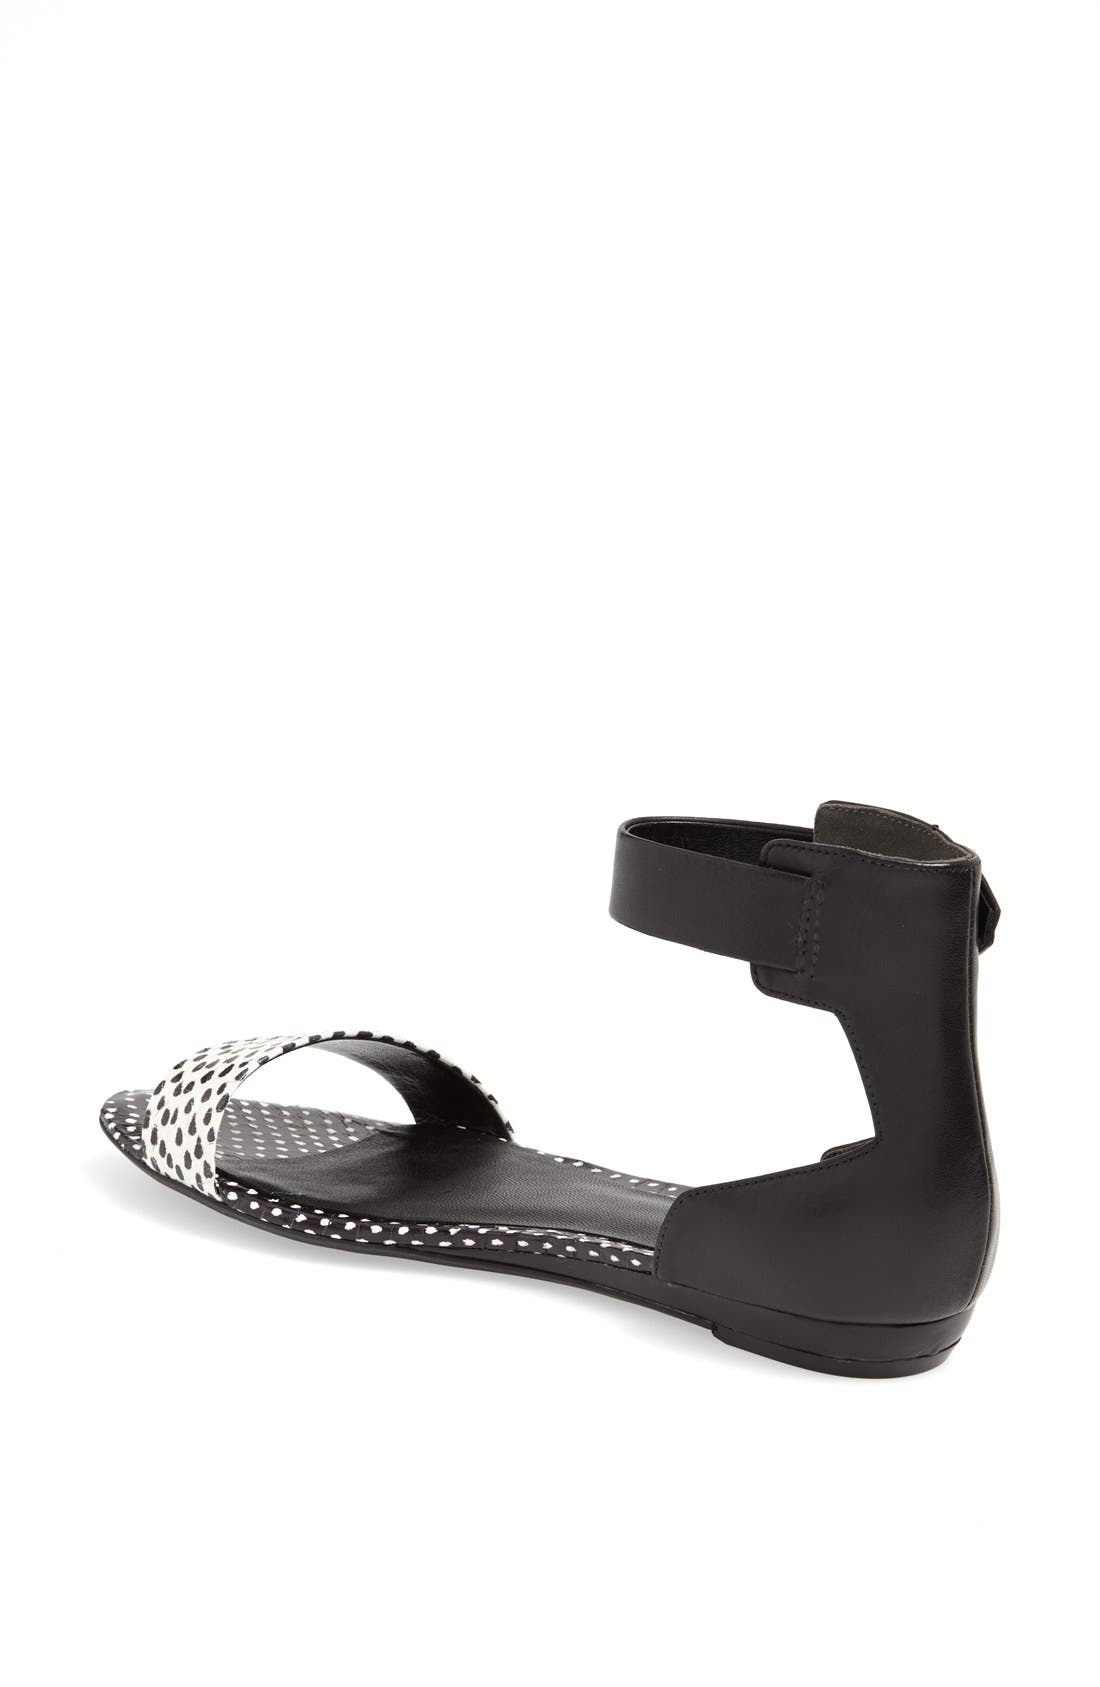 Alternate Image 2  - Kenneth Cole New York 'Essex' Sandal